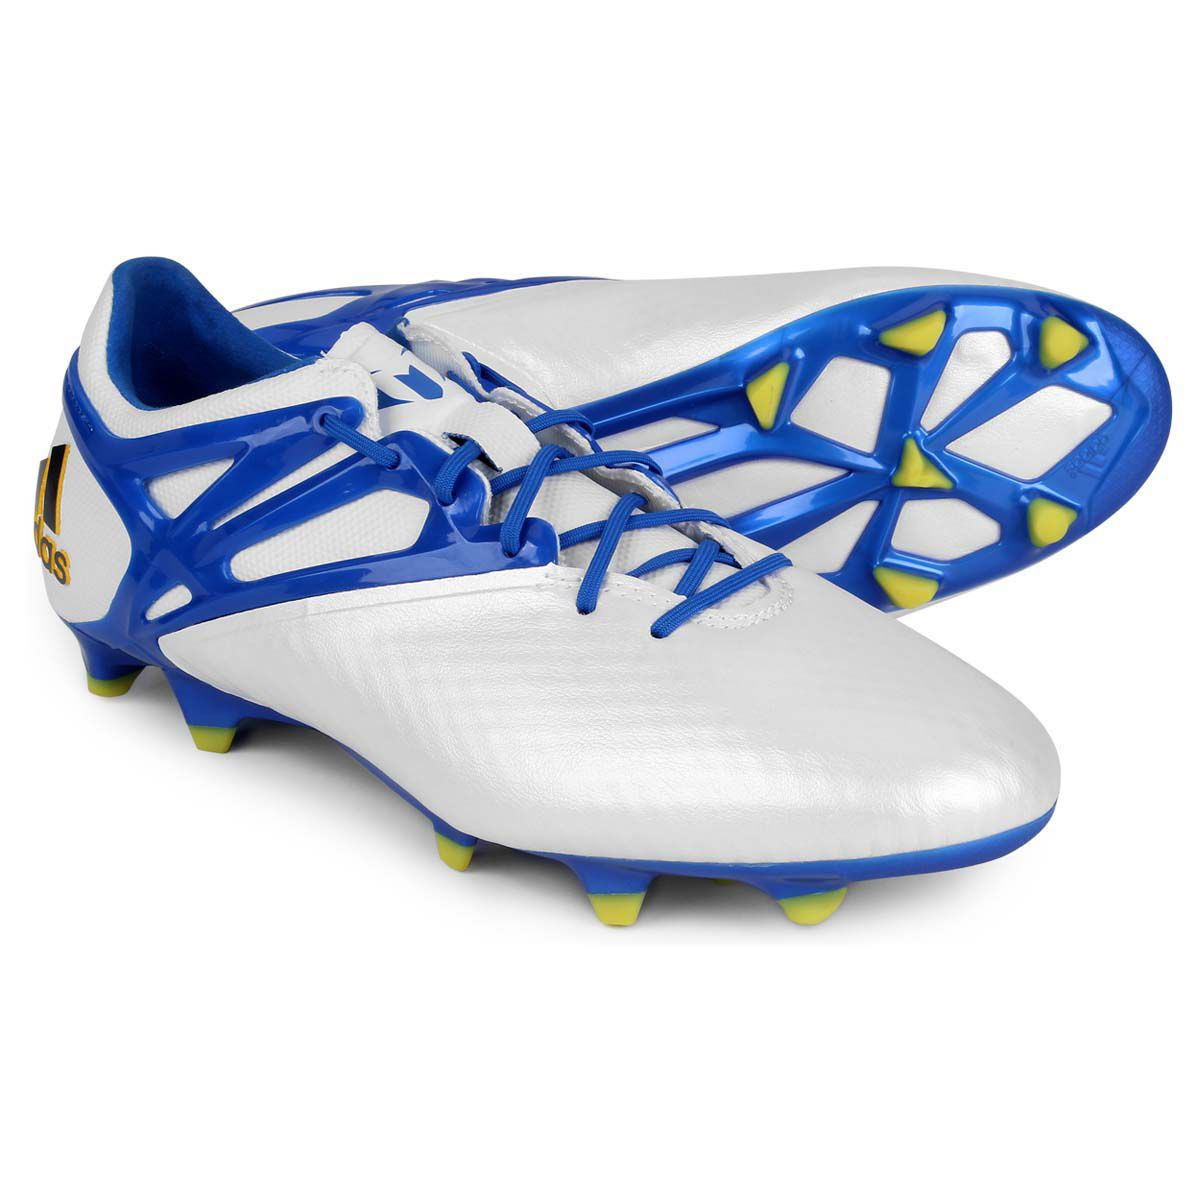 90a58daf37 Chuteira Adidas Messi 15.1 FG AG Profissional - Stigli